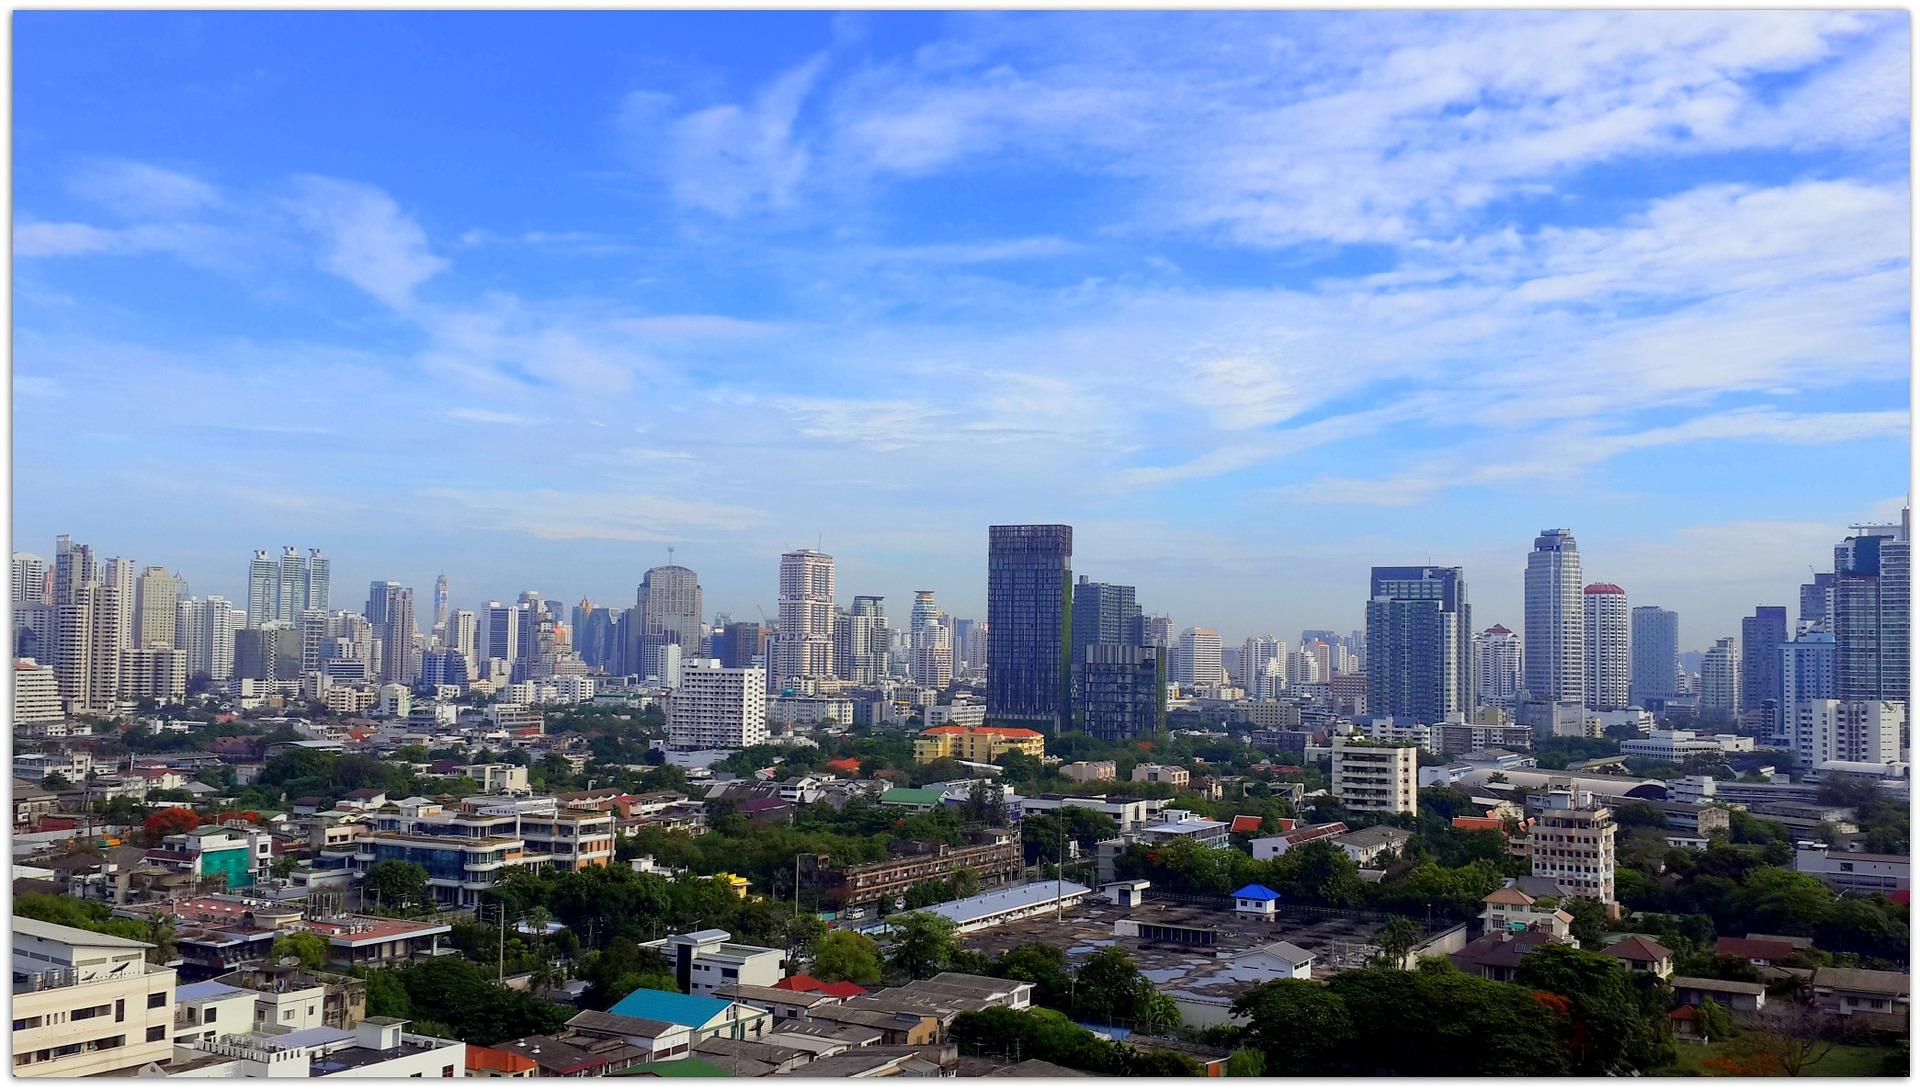 Bangkok, capital of Thailand